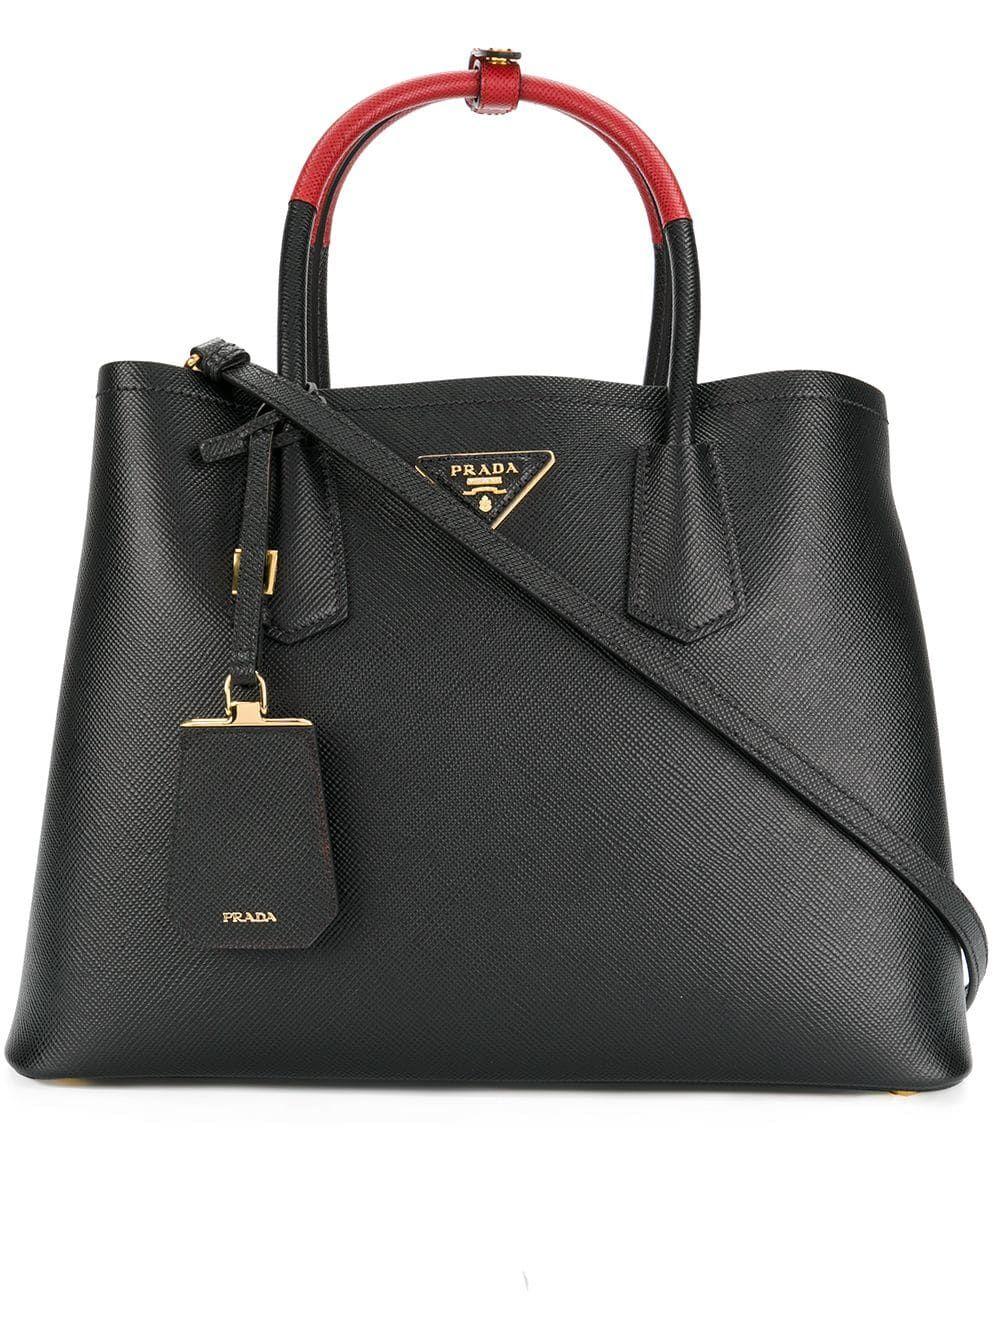 f0eada78671 Prada Double tote bag - Black in 2019 | Products | Prada tote bag ...